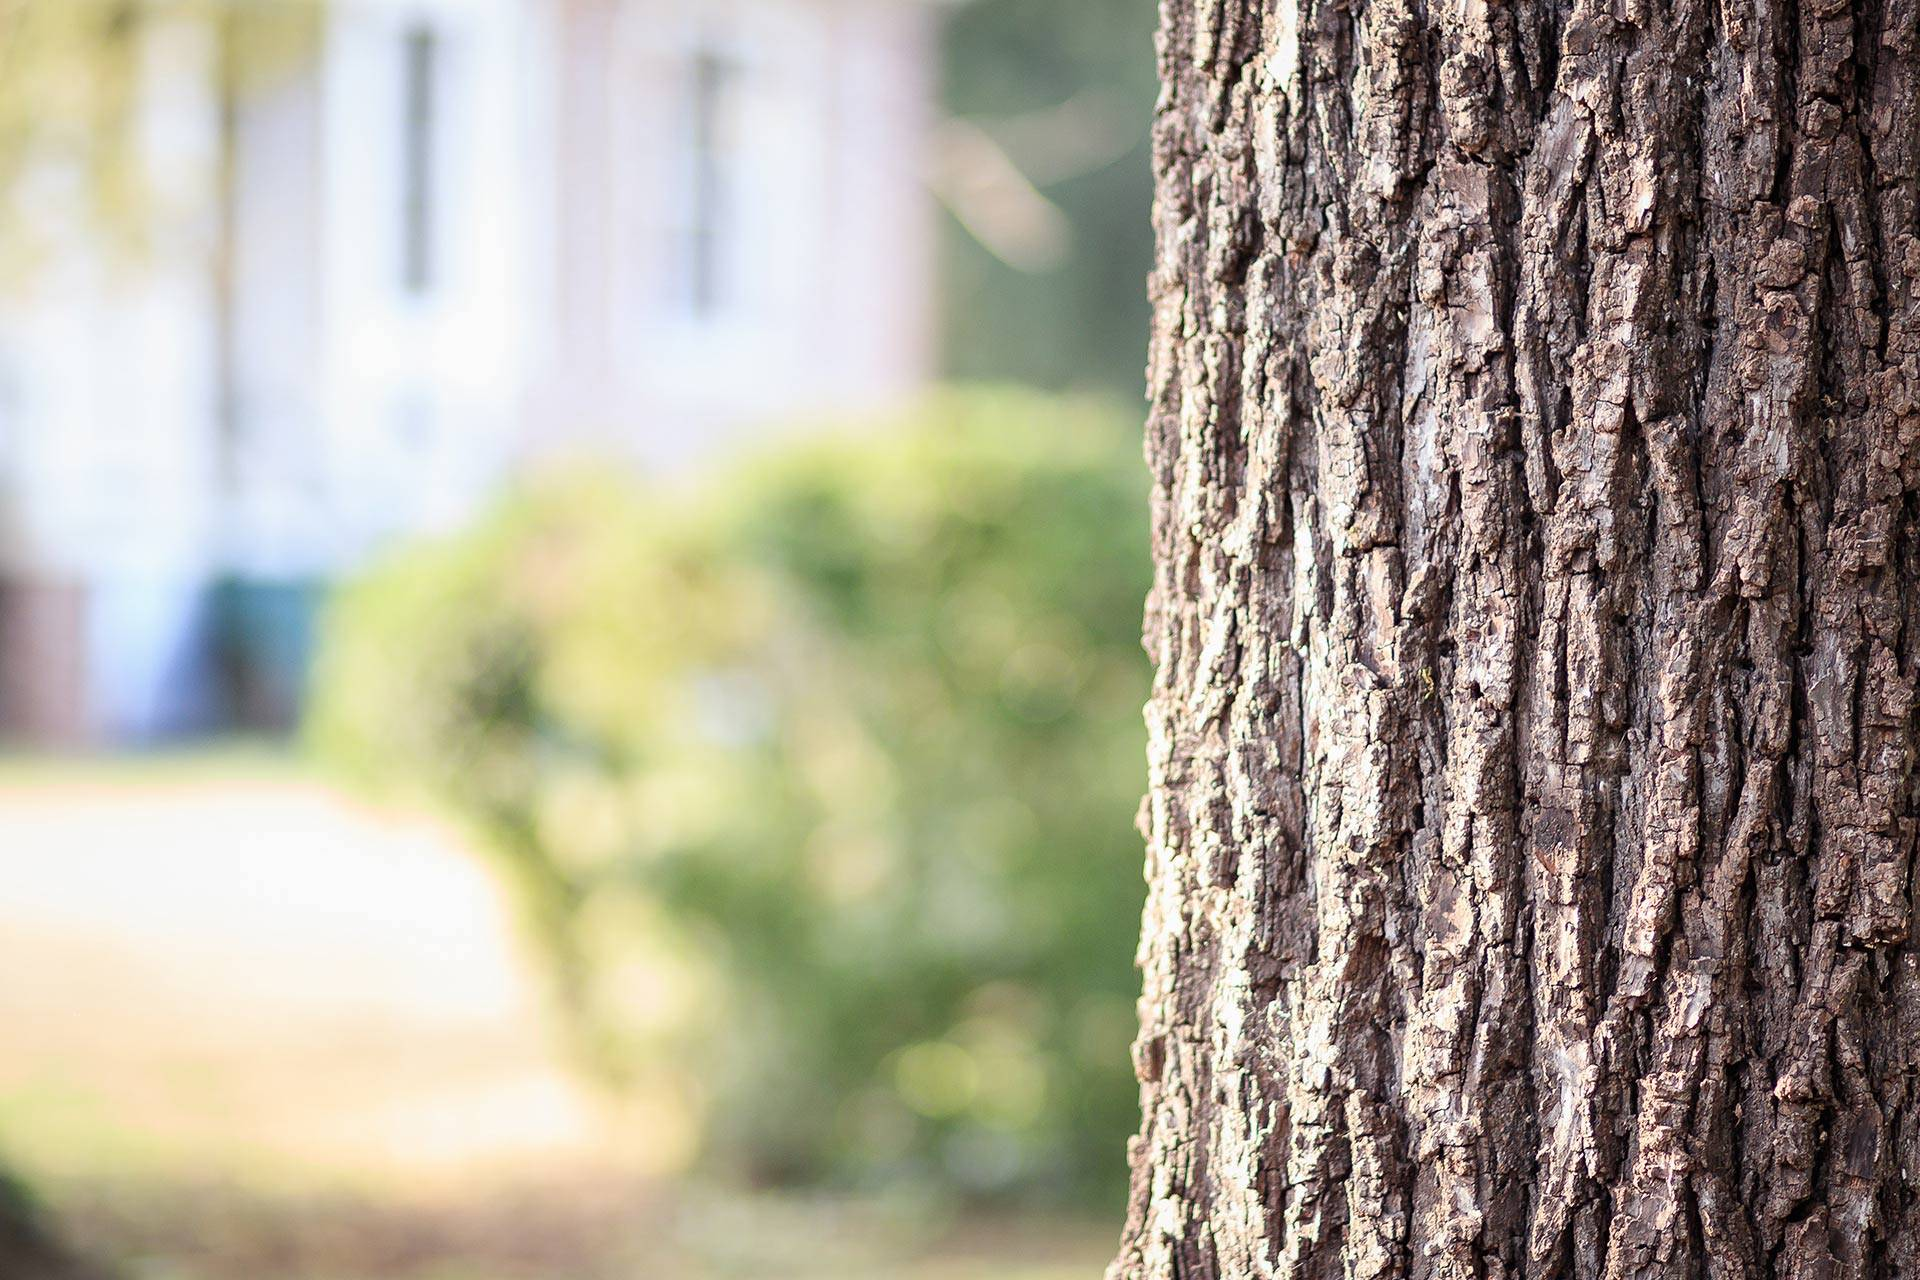 Tree Surveys and Risk Assessments